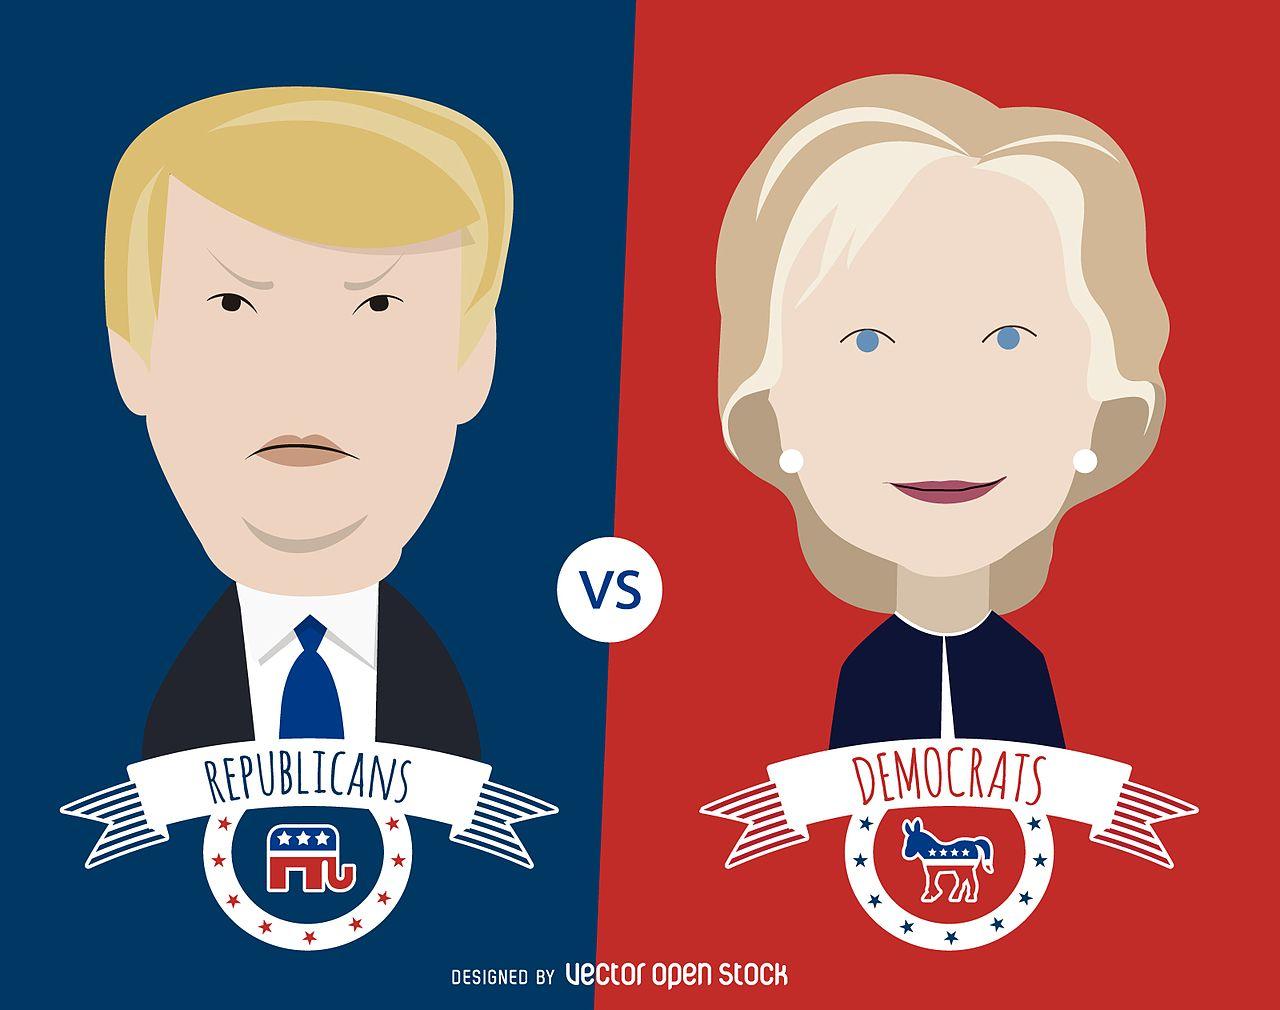 2016 Clinton and Trump VectorOpenStock  commons.wikimedia.org